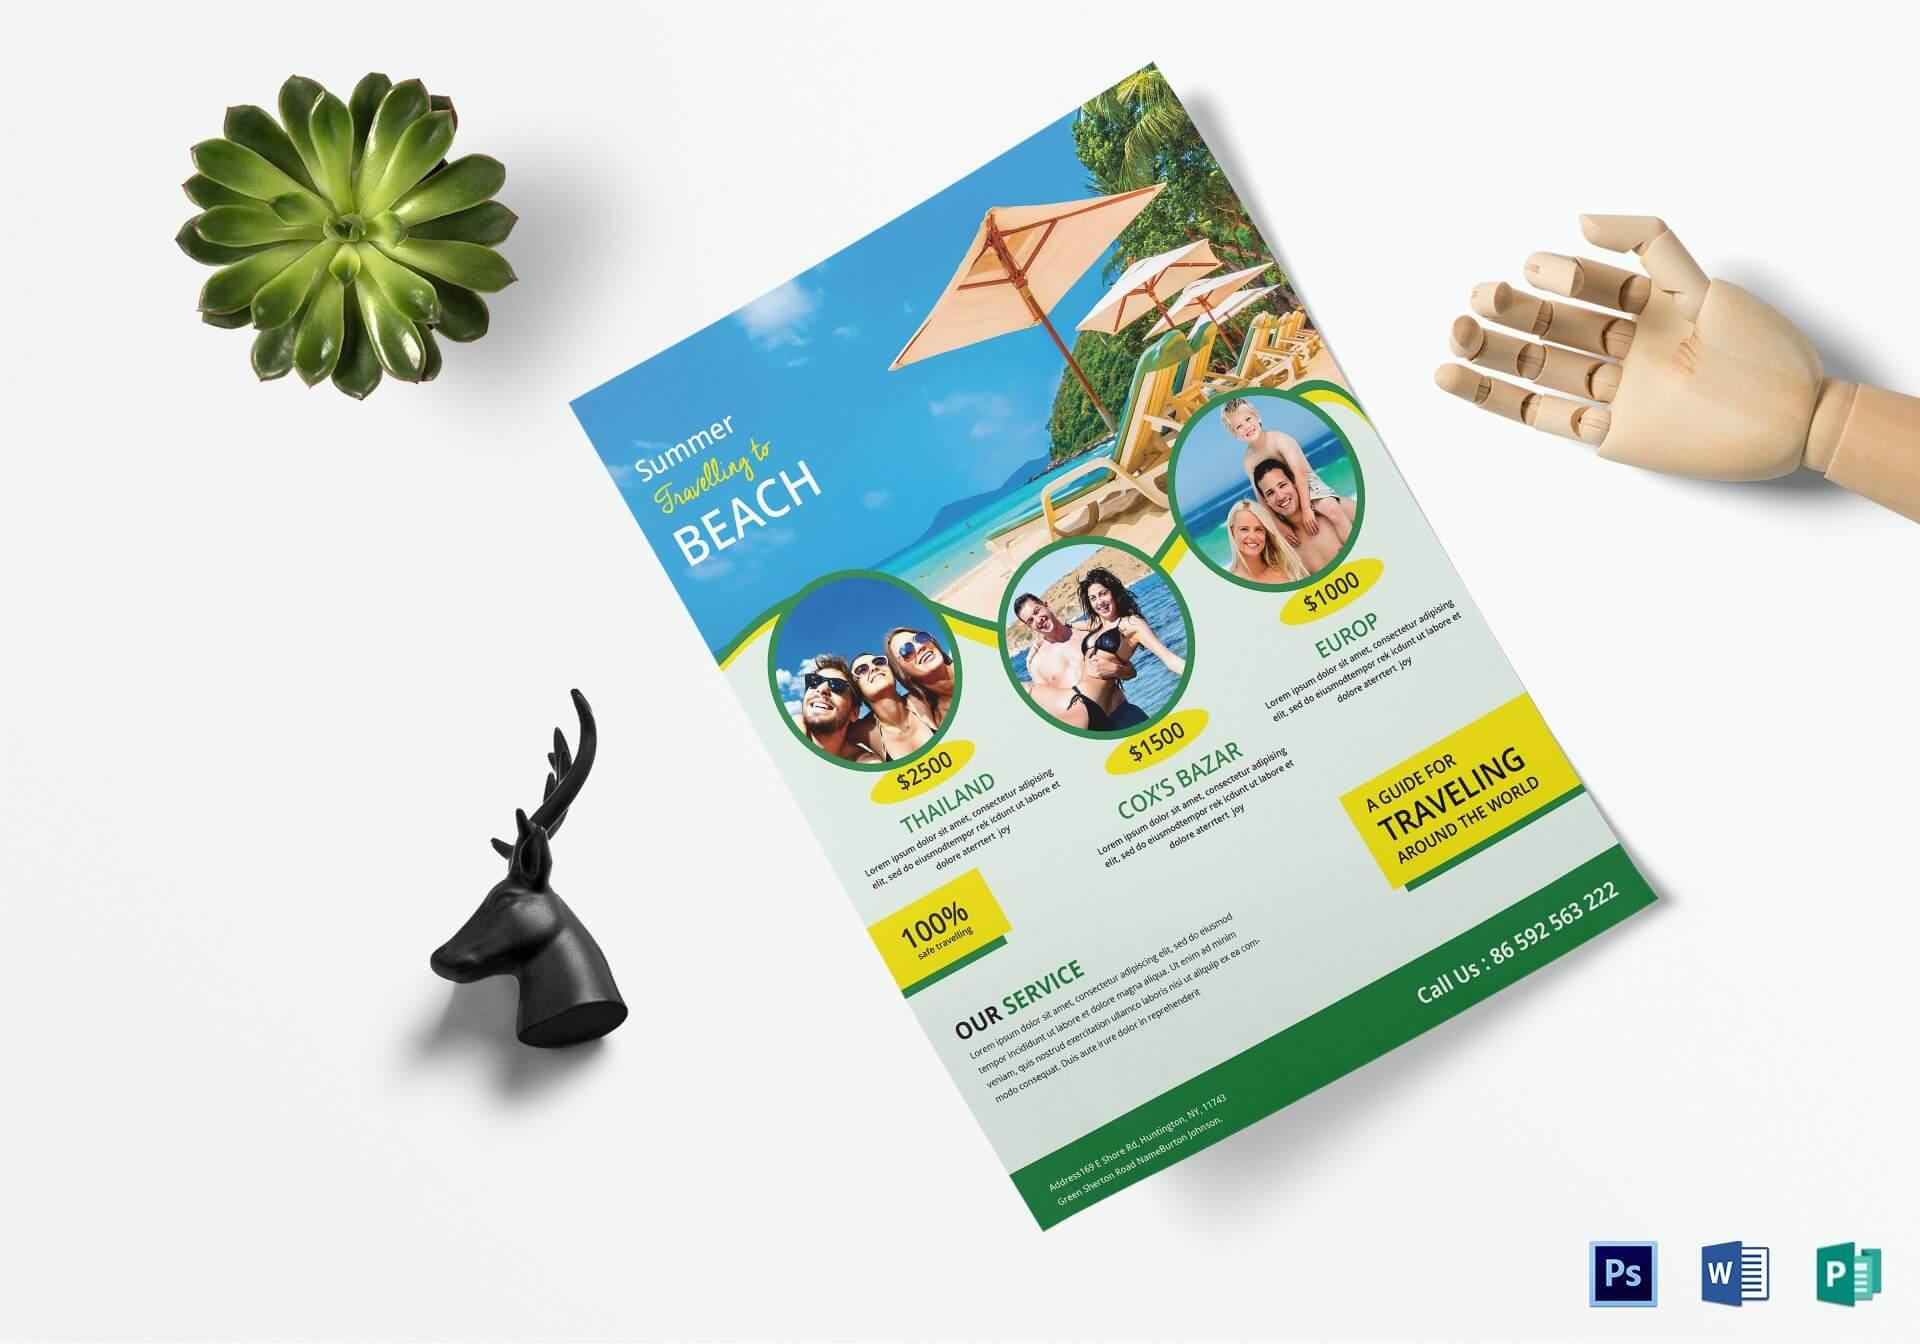 Travel Brochure Design – Tourism Company And Tourism With Regard To Travel Brochure Template Ks2